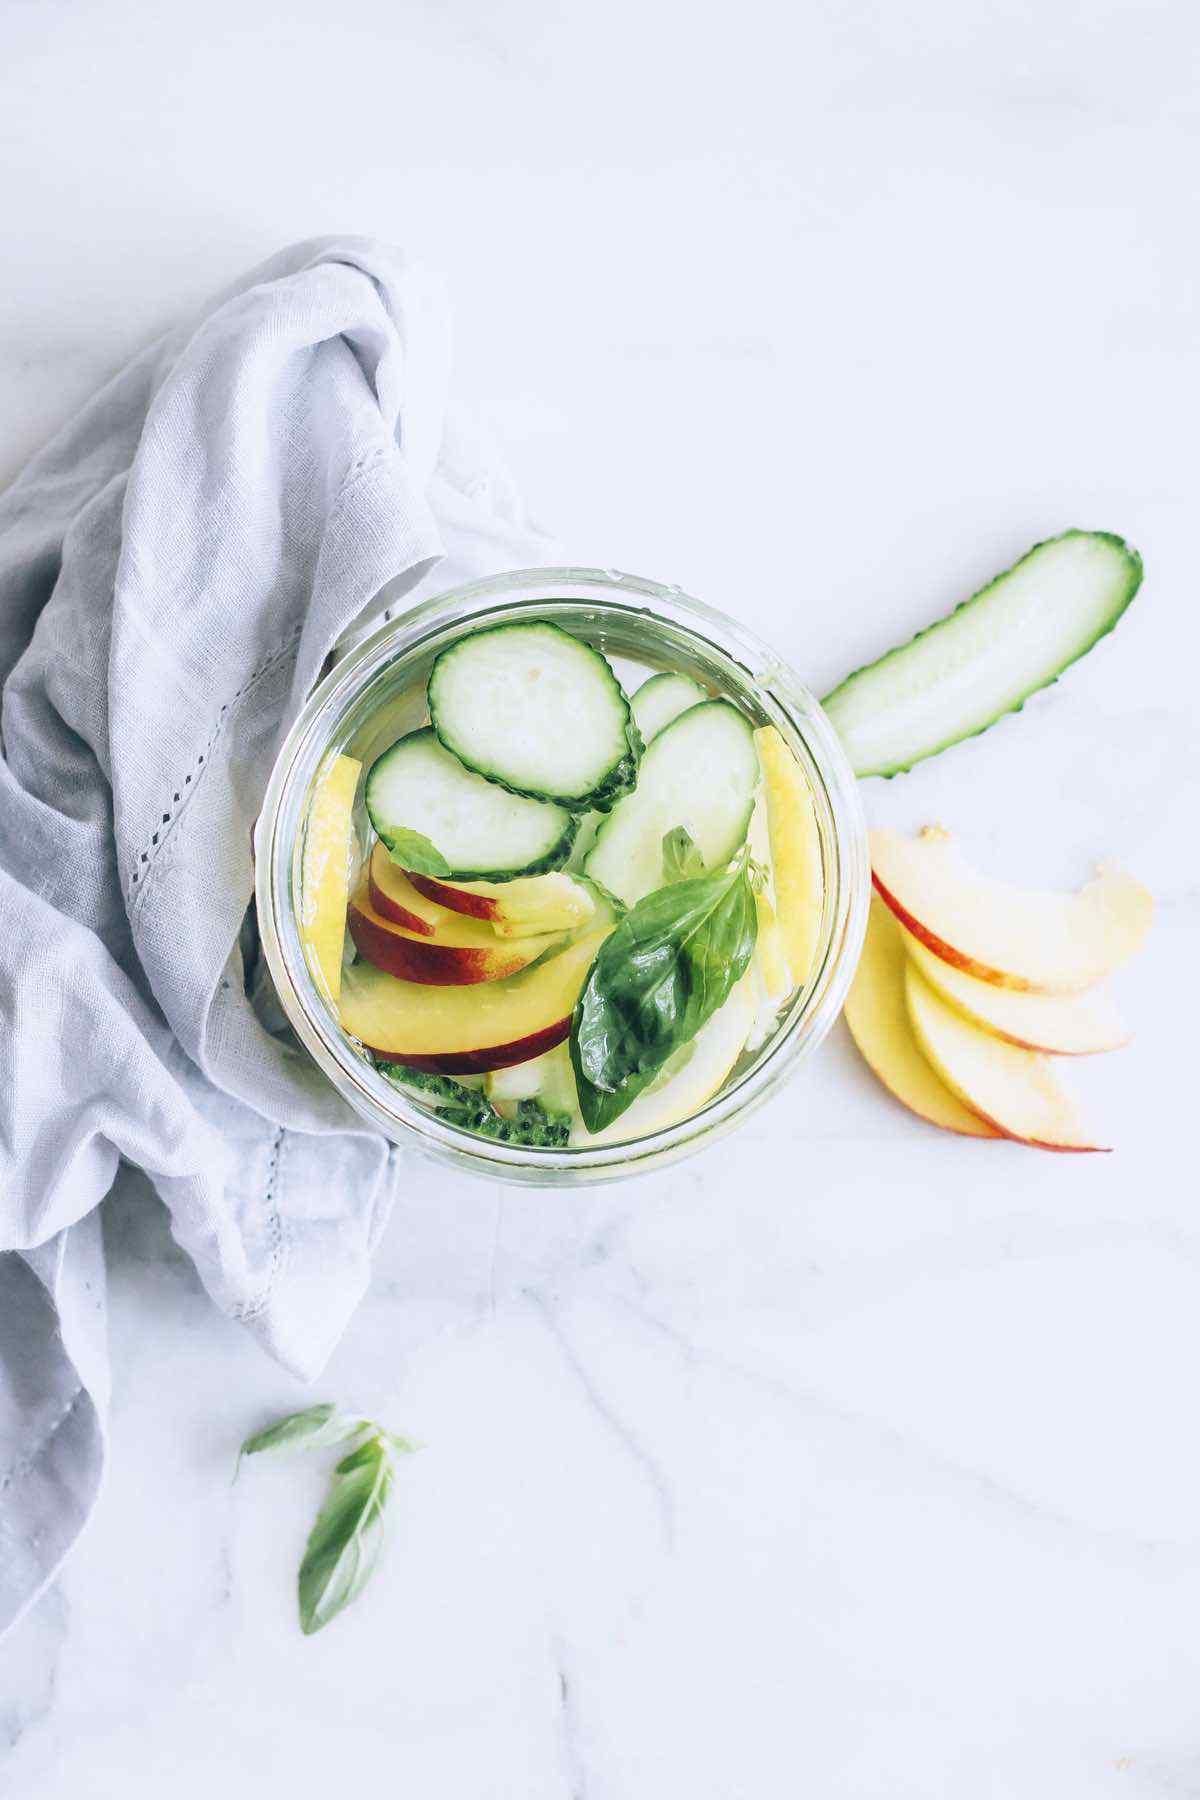 Best Peach-Infused Water